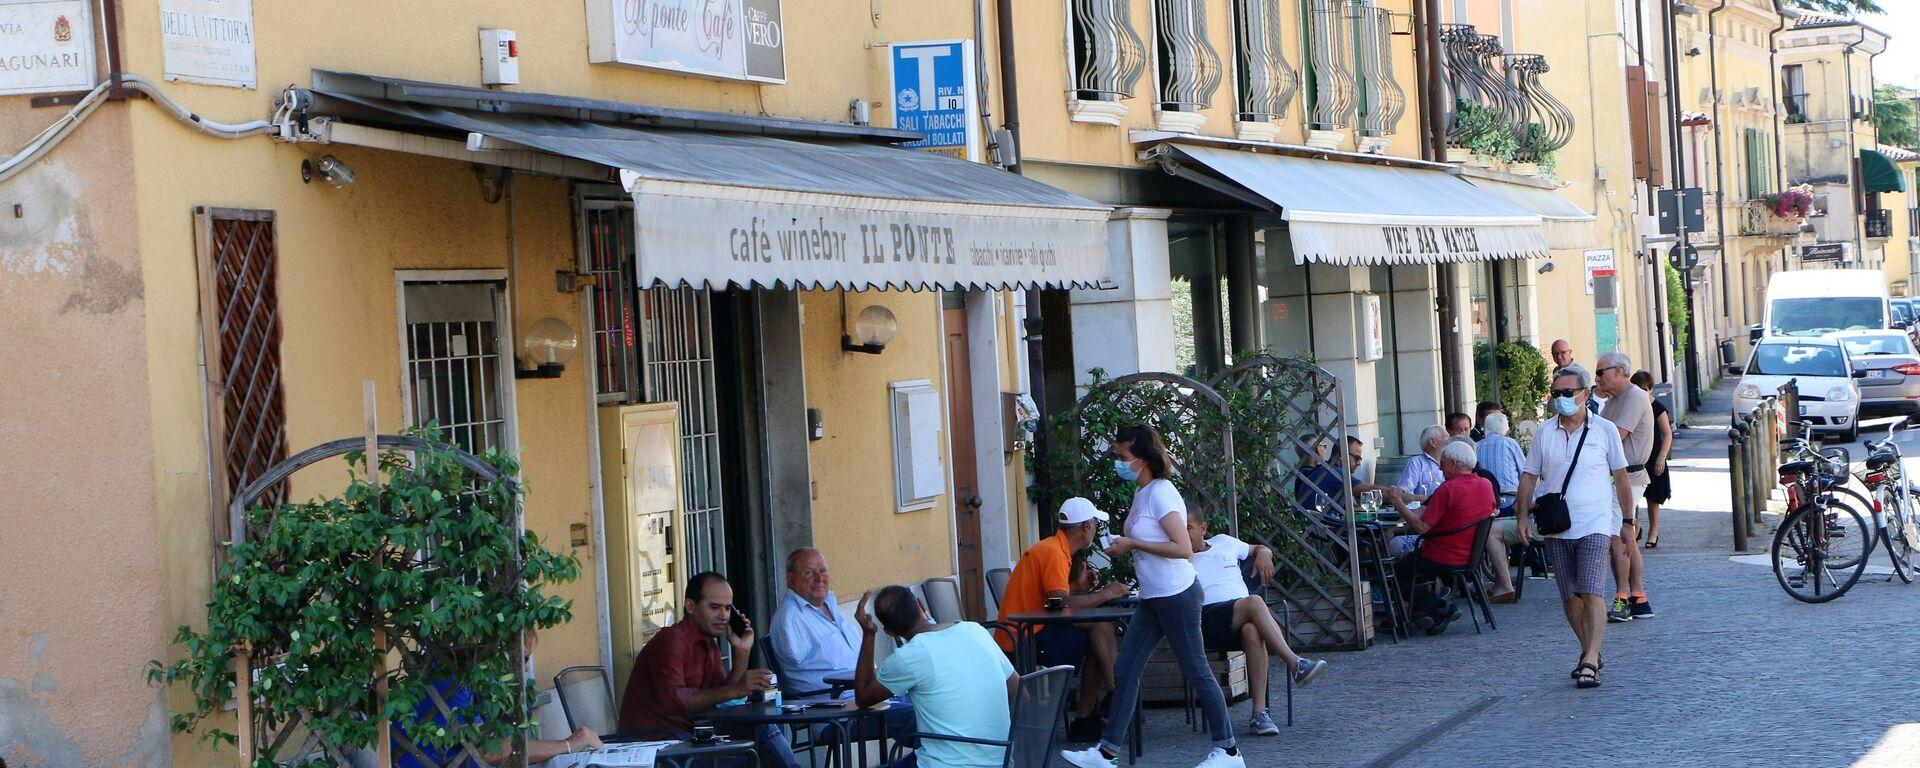 La gente al bar in Italia - Sputnik Italia, 1920, 07.06.2021